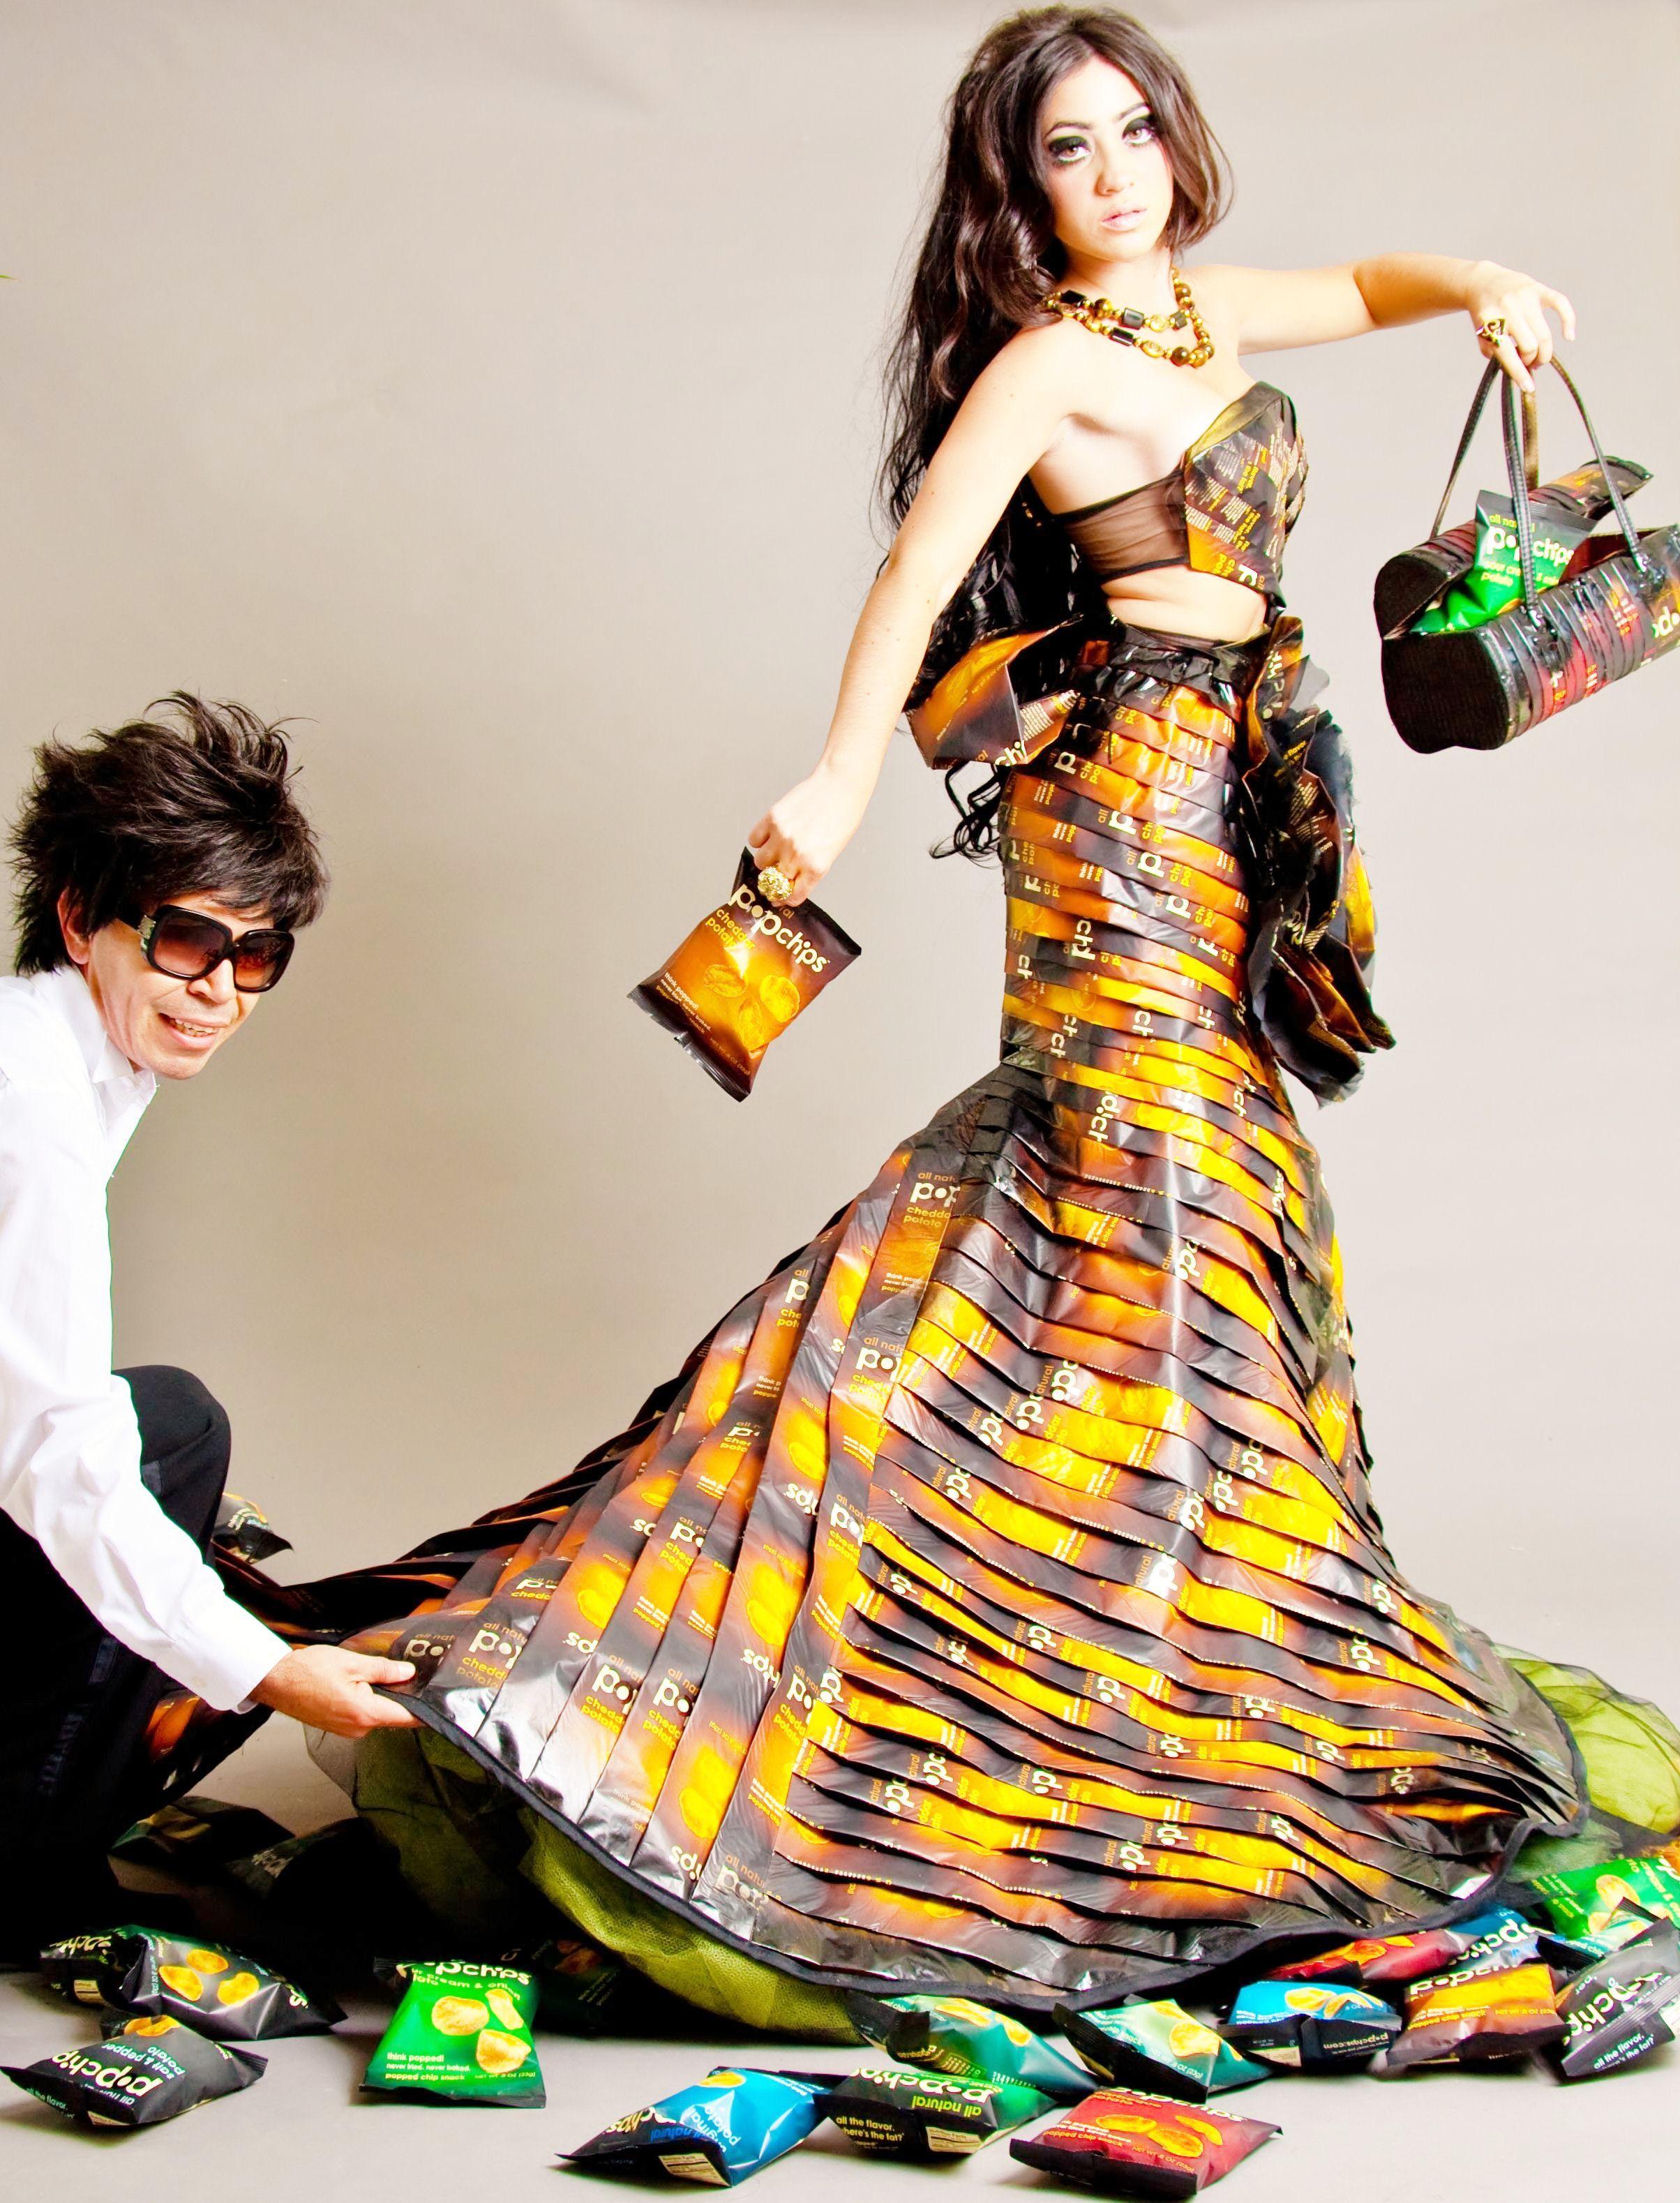 popchips dress by merlin castell fashion inspiration on extraordinary clever minimalist wardrobe ideas id=84381